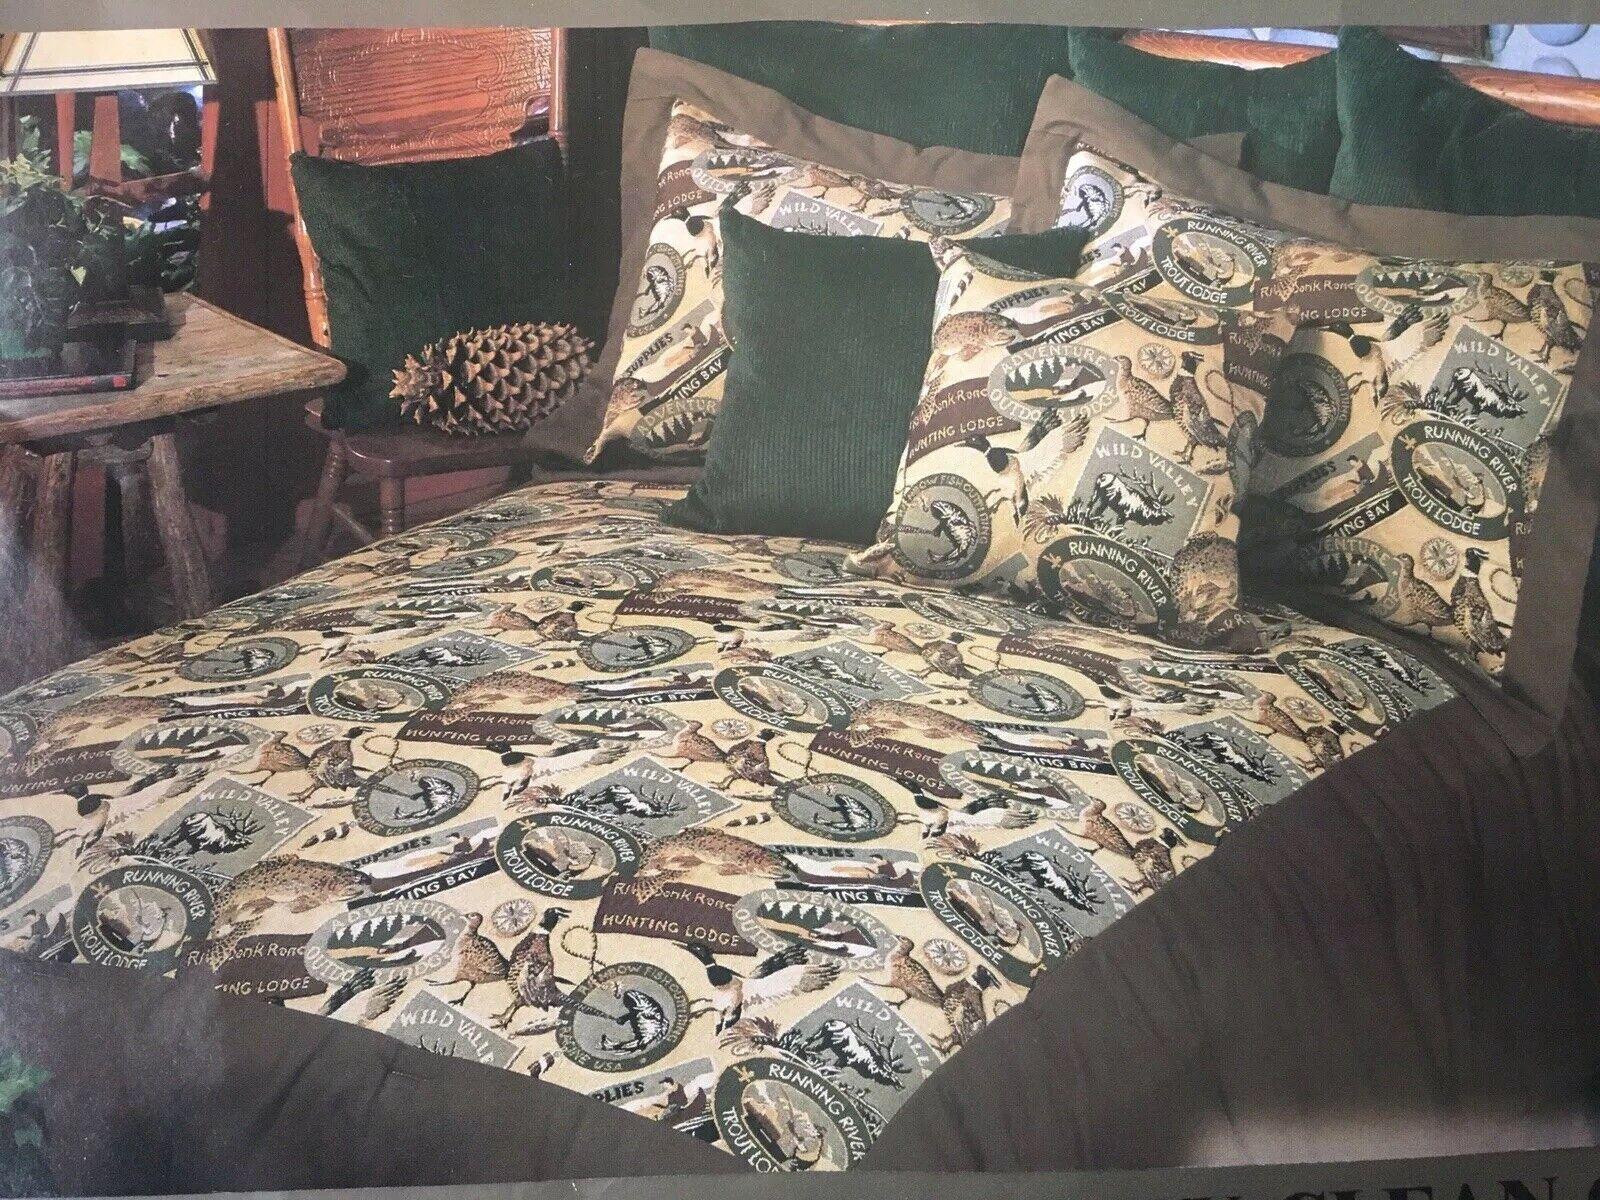 Karin Maki Daybed Comforter HUNTING Fishing Vtg Style CABIN  Bedspread Set NEW